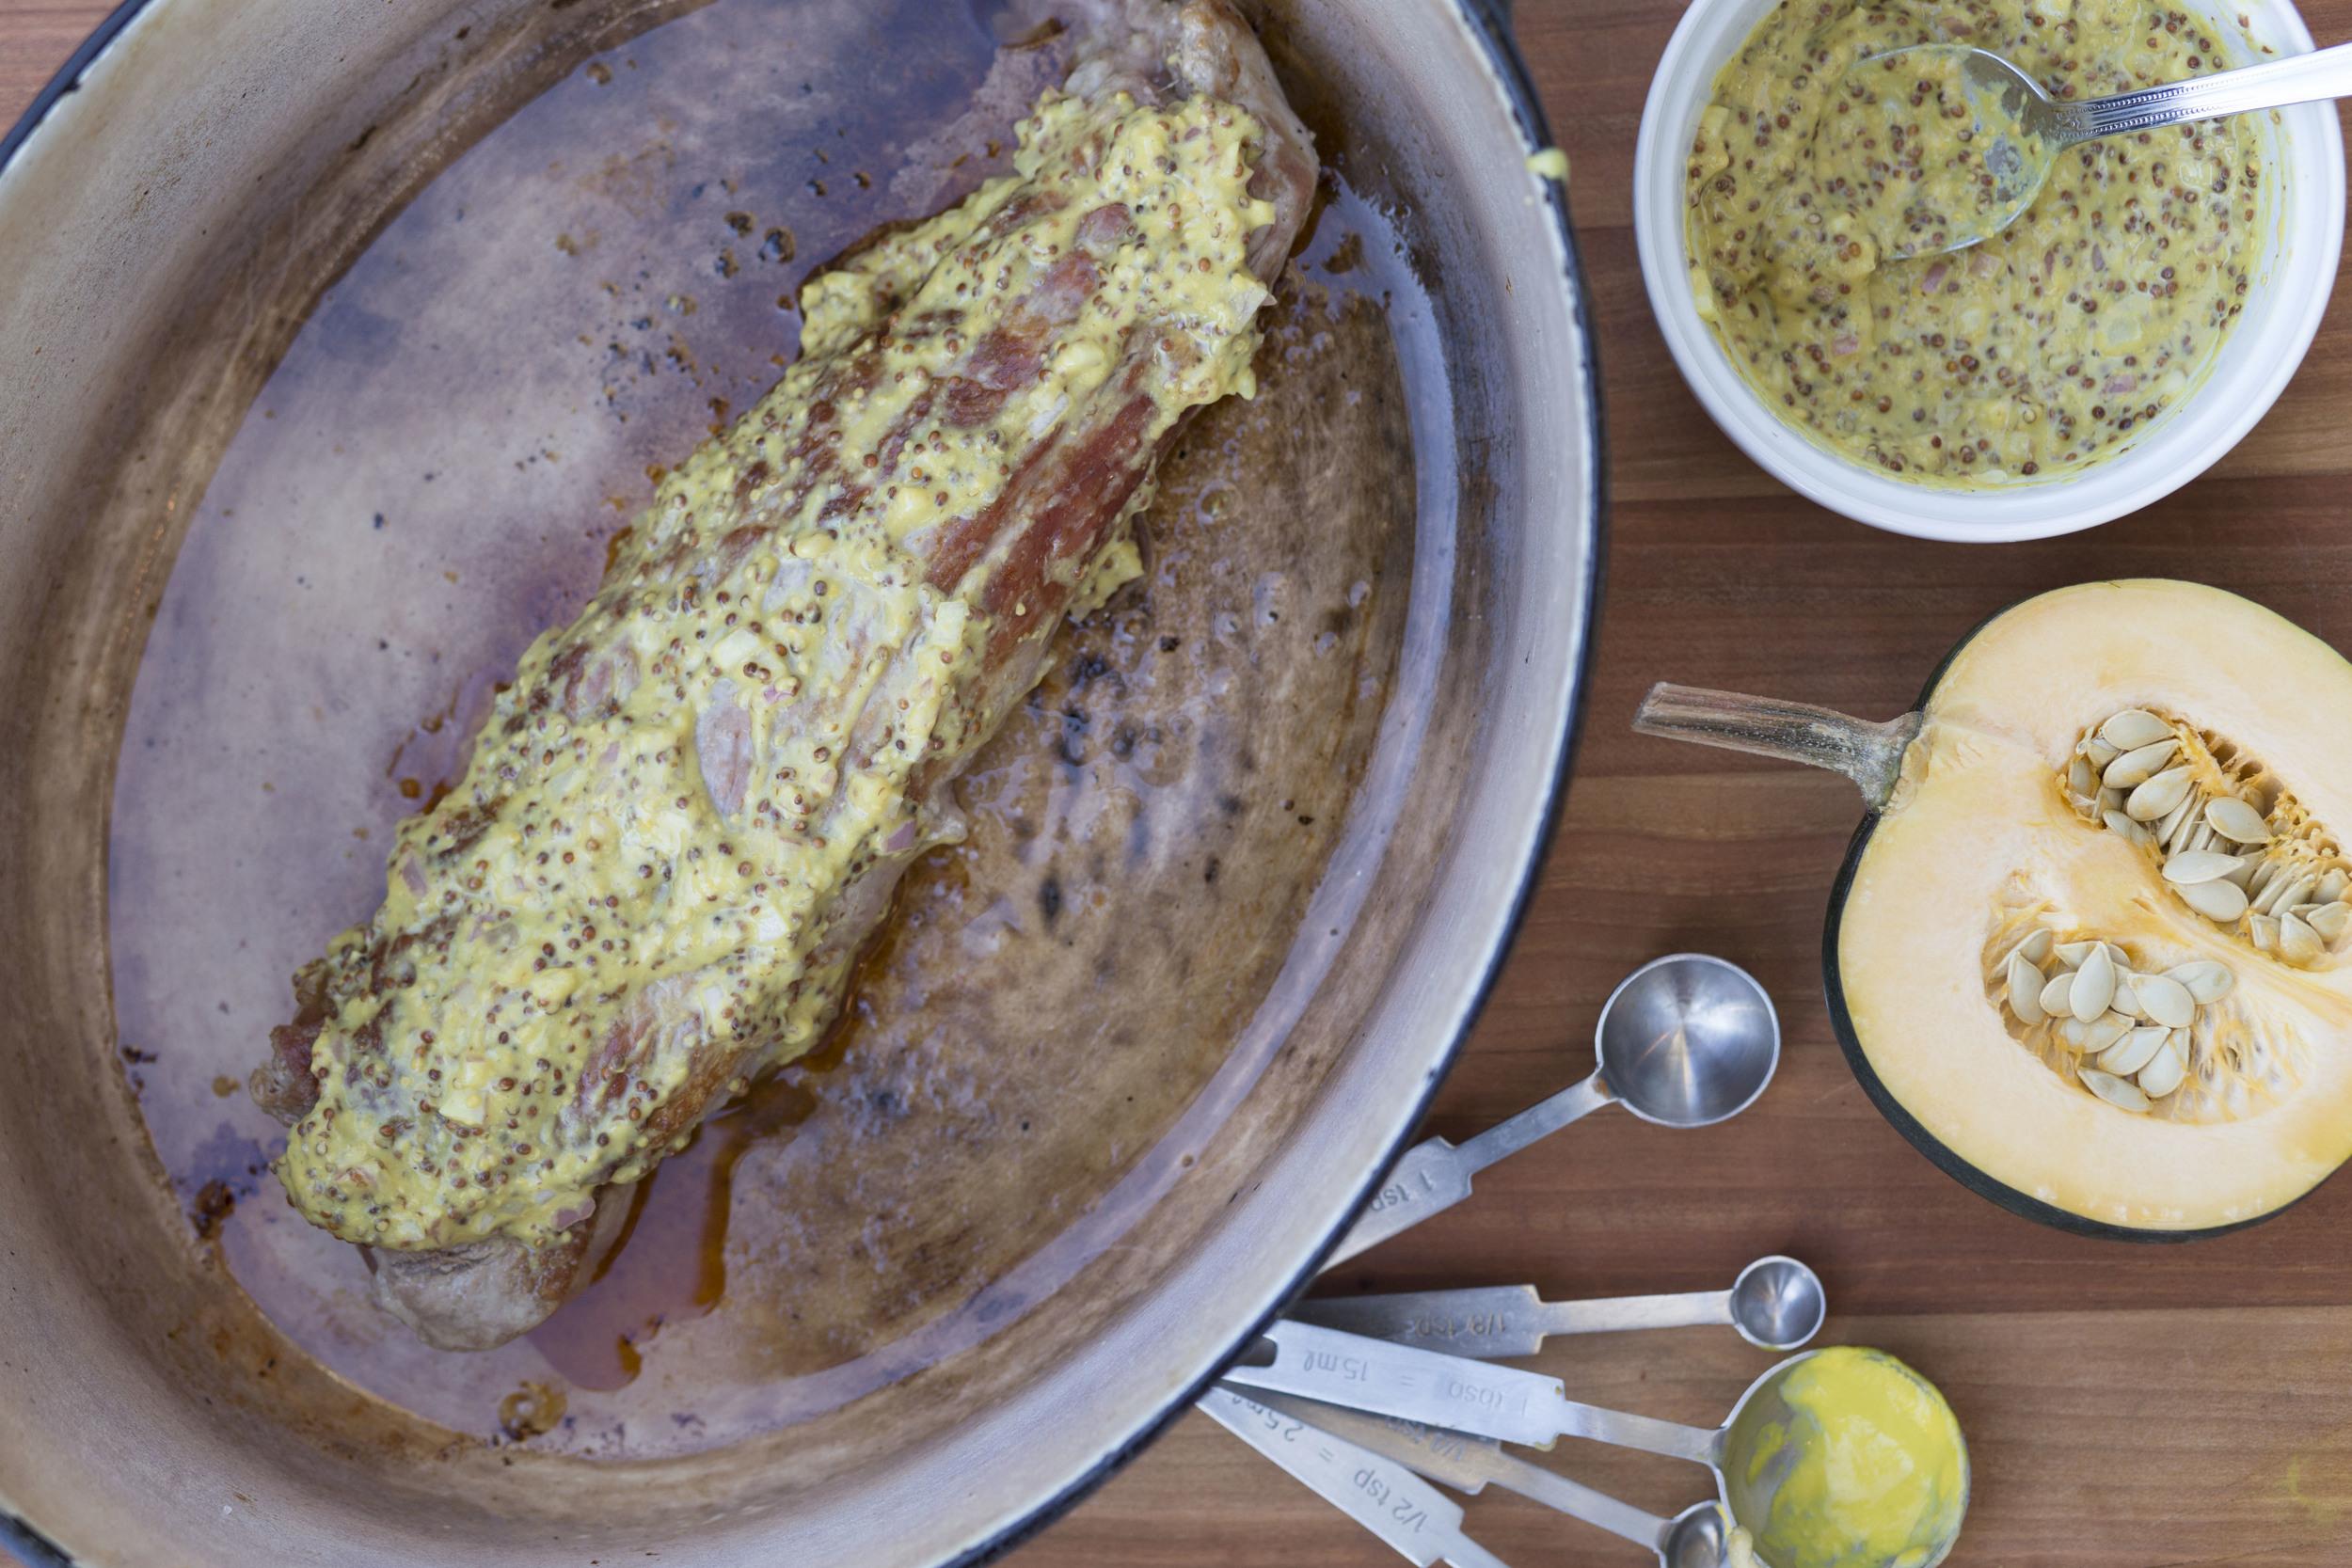 Roasted Pork Tenderloin with Mustard